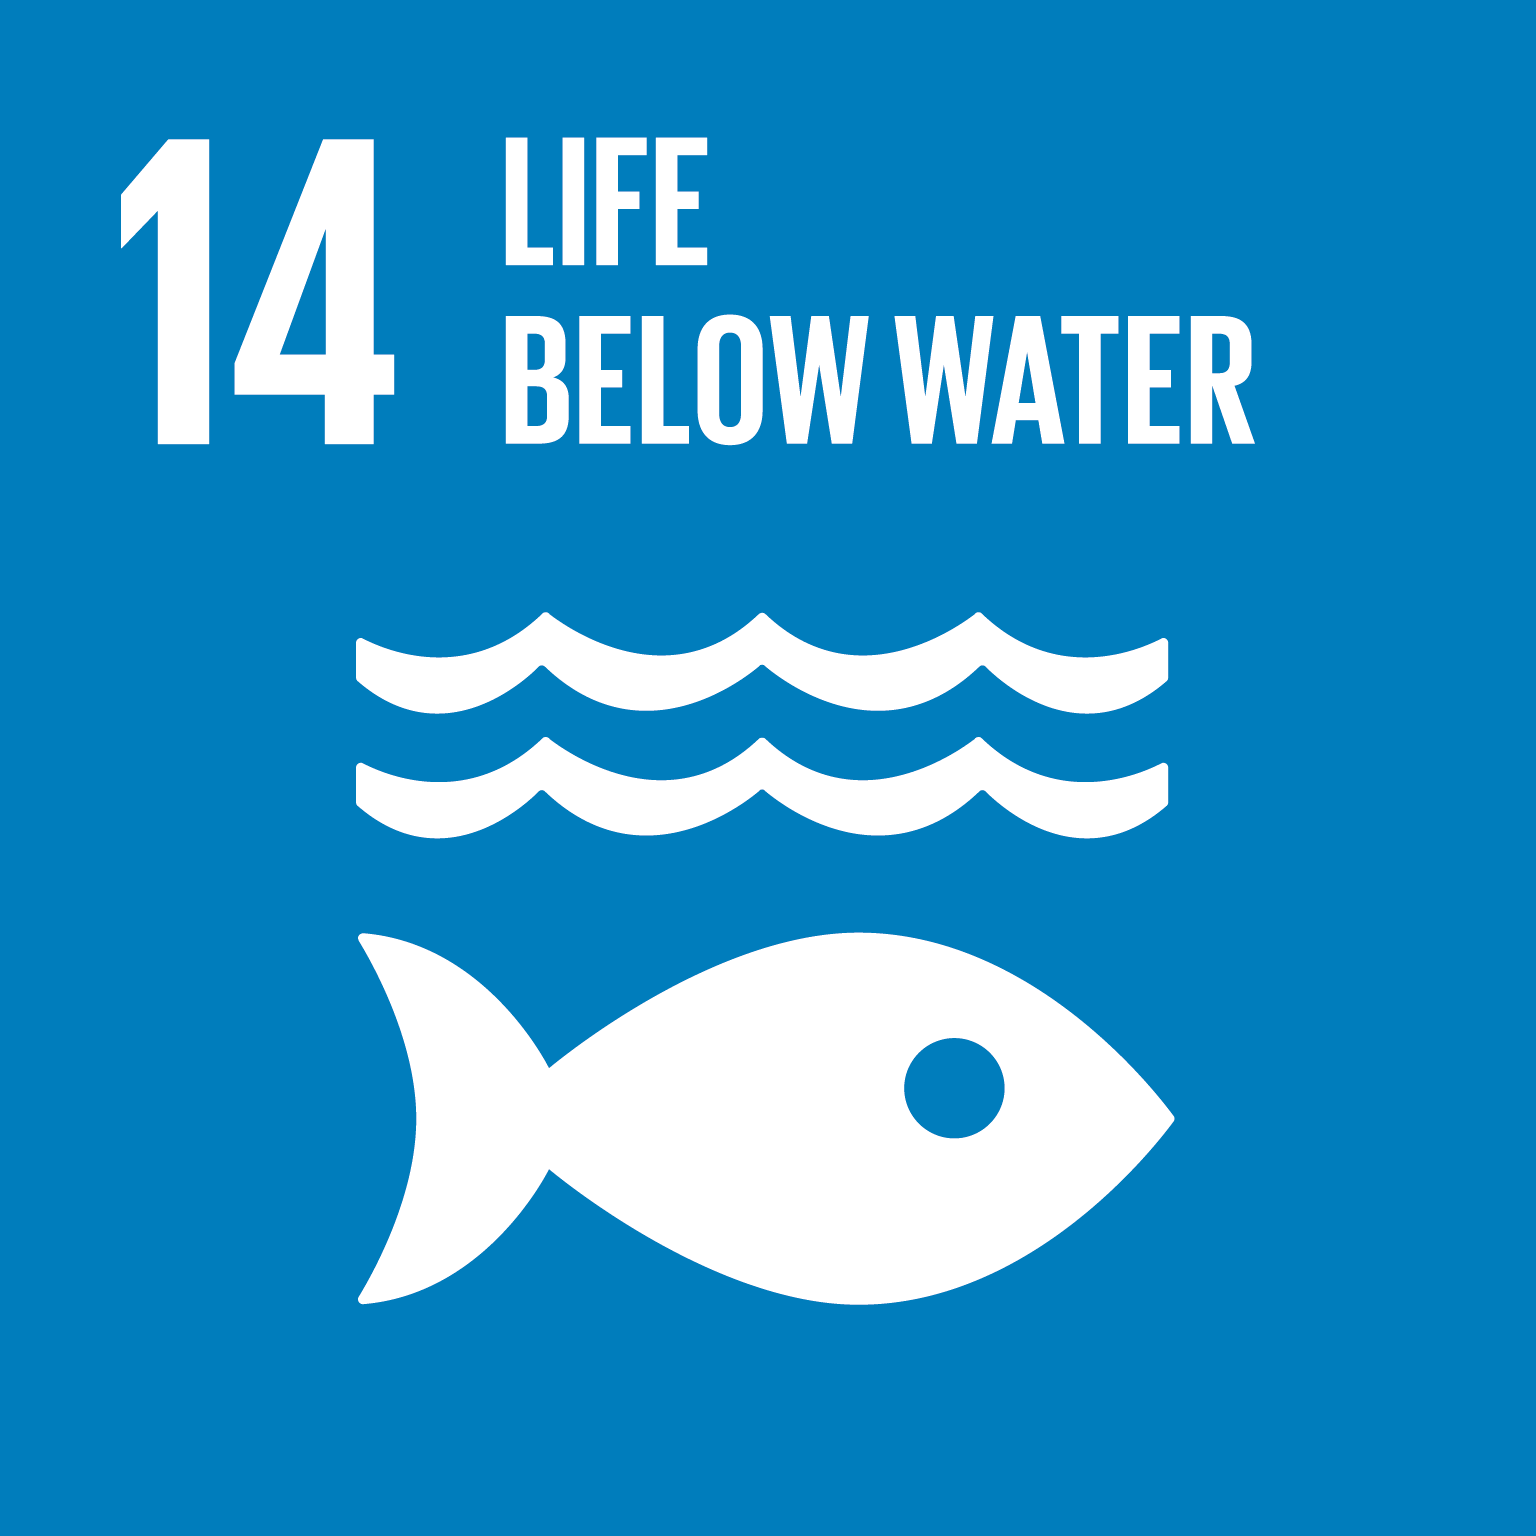 life below water.png